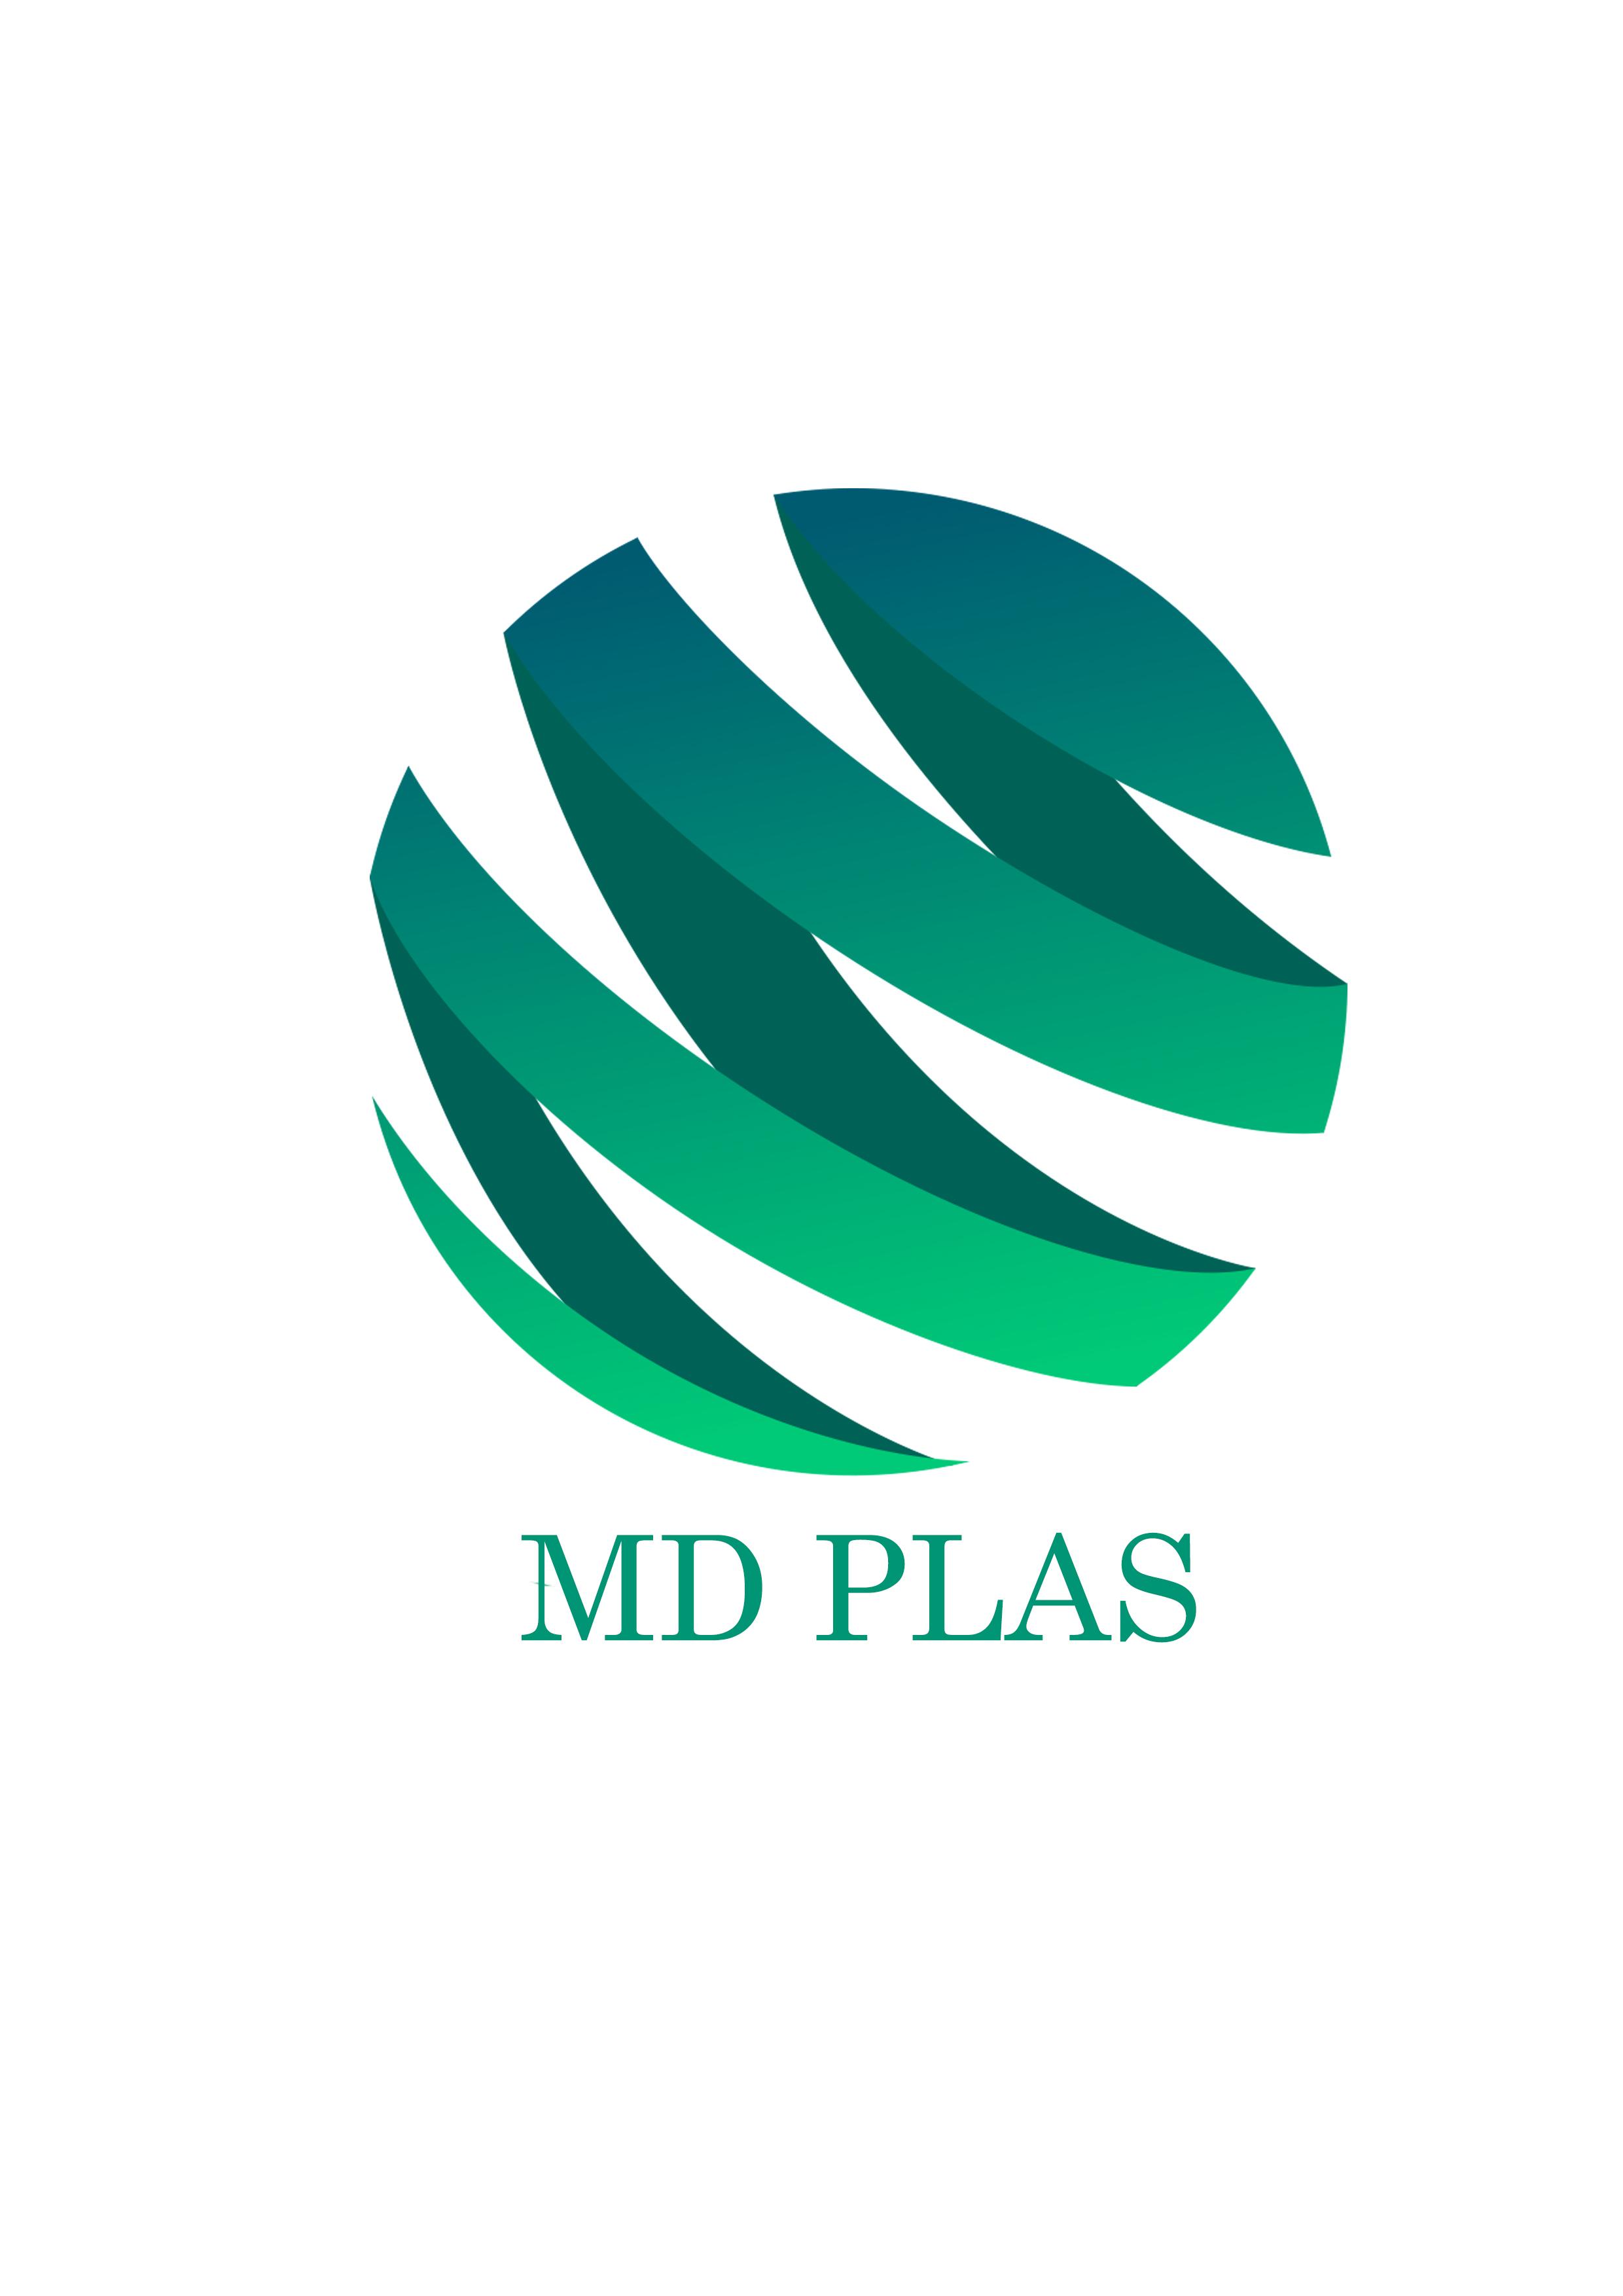 Logomarca MD Plas